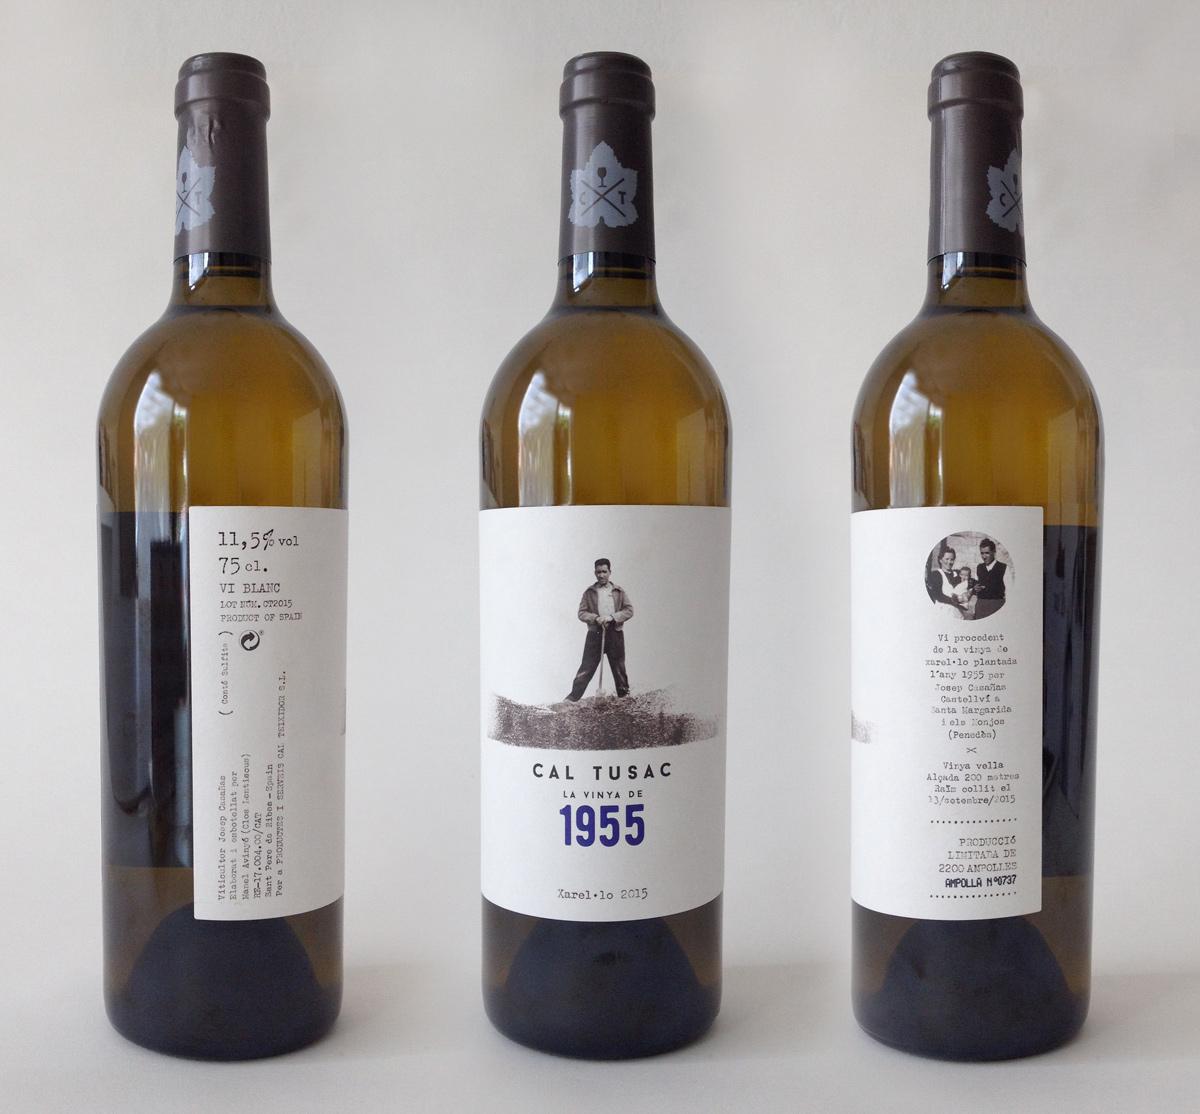 imatge corporativa, disseny gràfic, il·lustració, ampolla, vi, cal tussac 1955, penedès